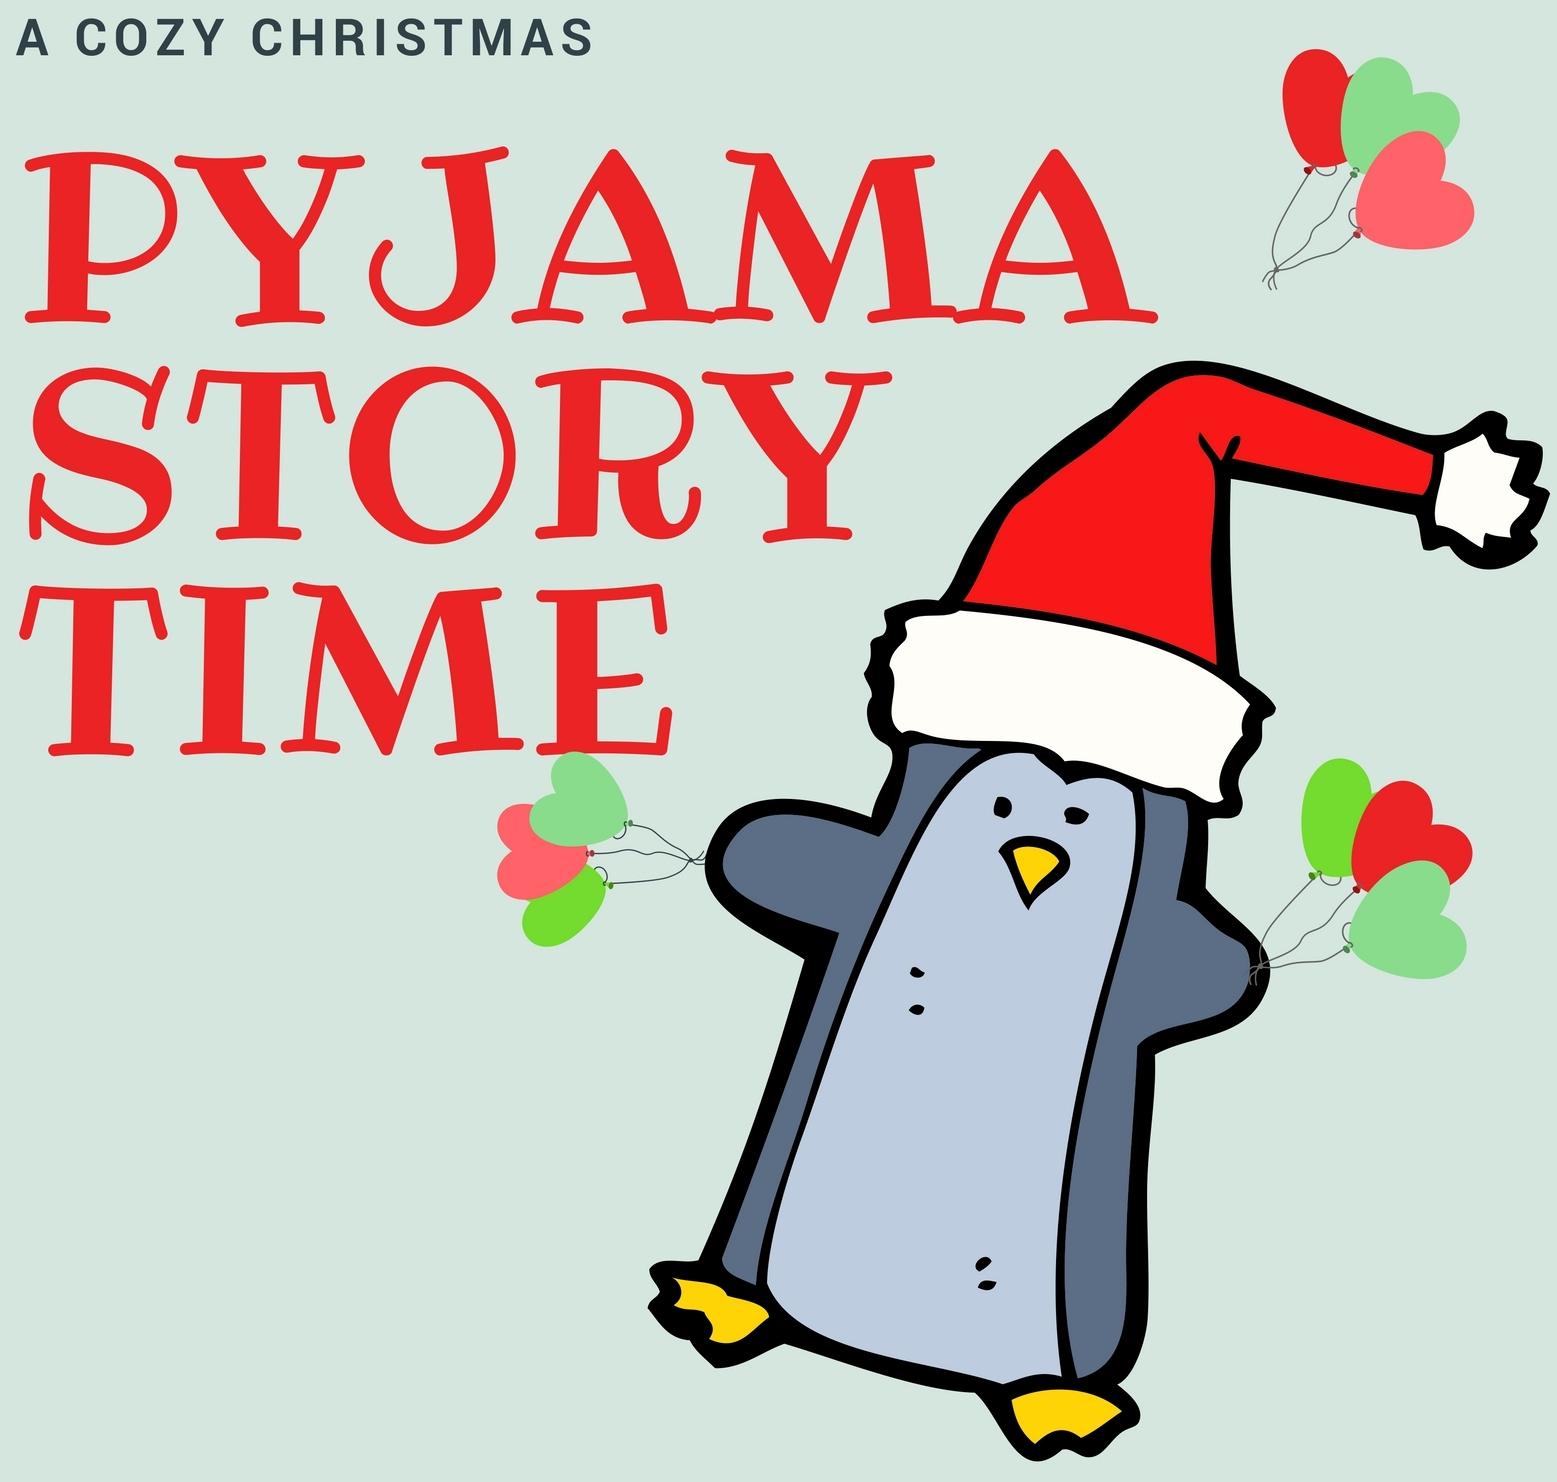 Christmas Pyjama Story Time @ Smithers Public Library